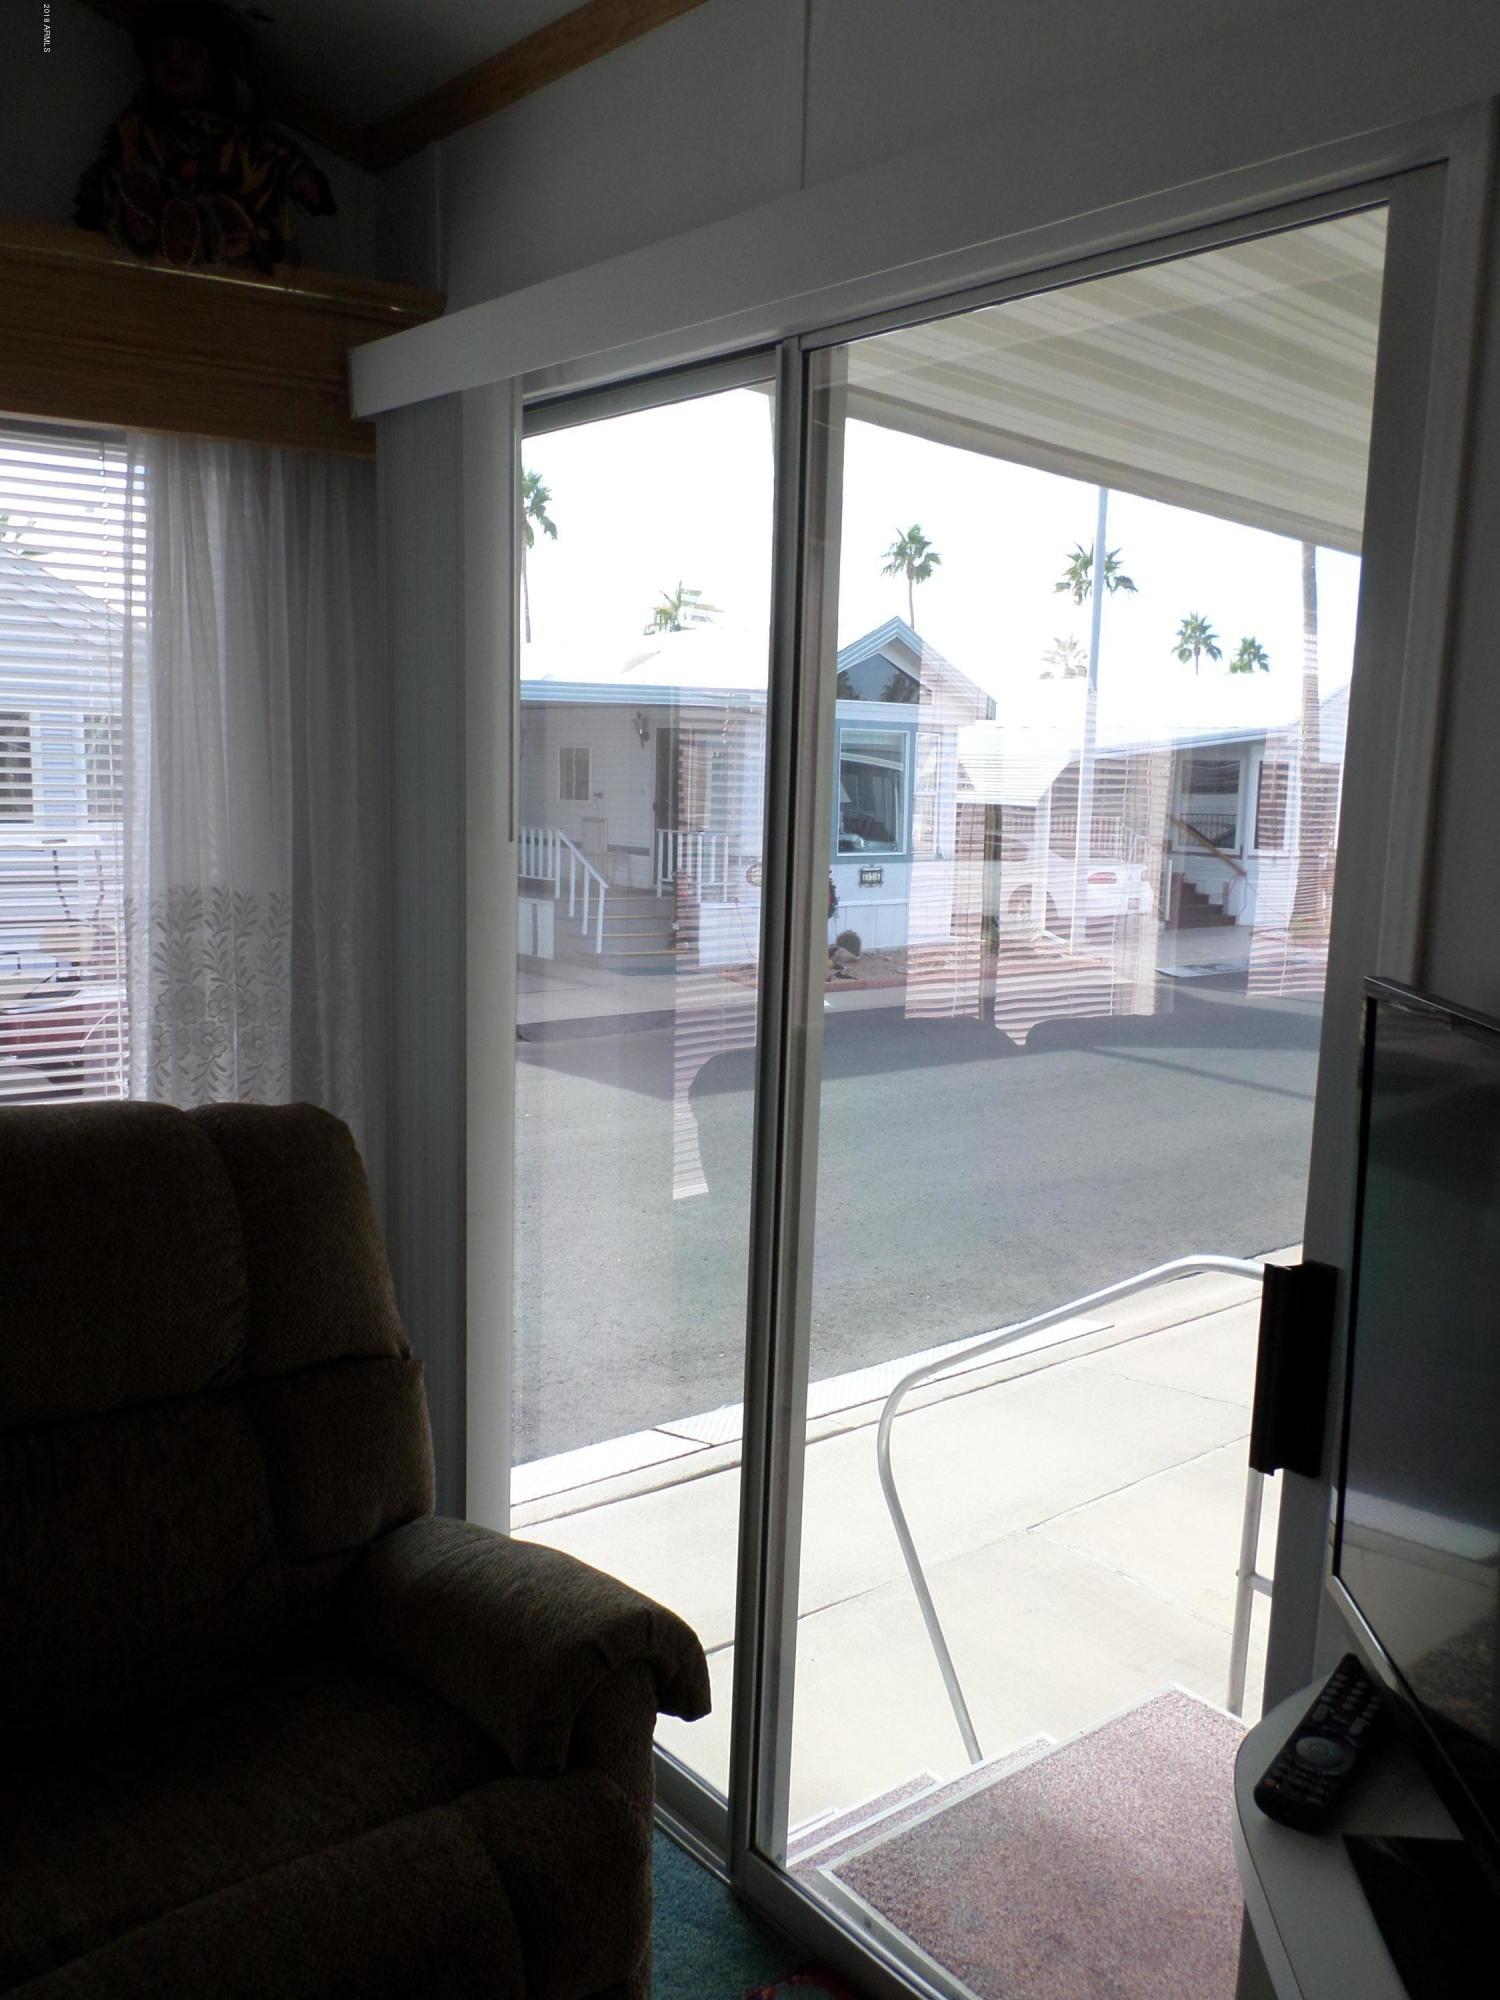 3710 S GOLDFIELD Road Apache Junction, AZ 85119 - MLS #: 5853844